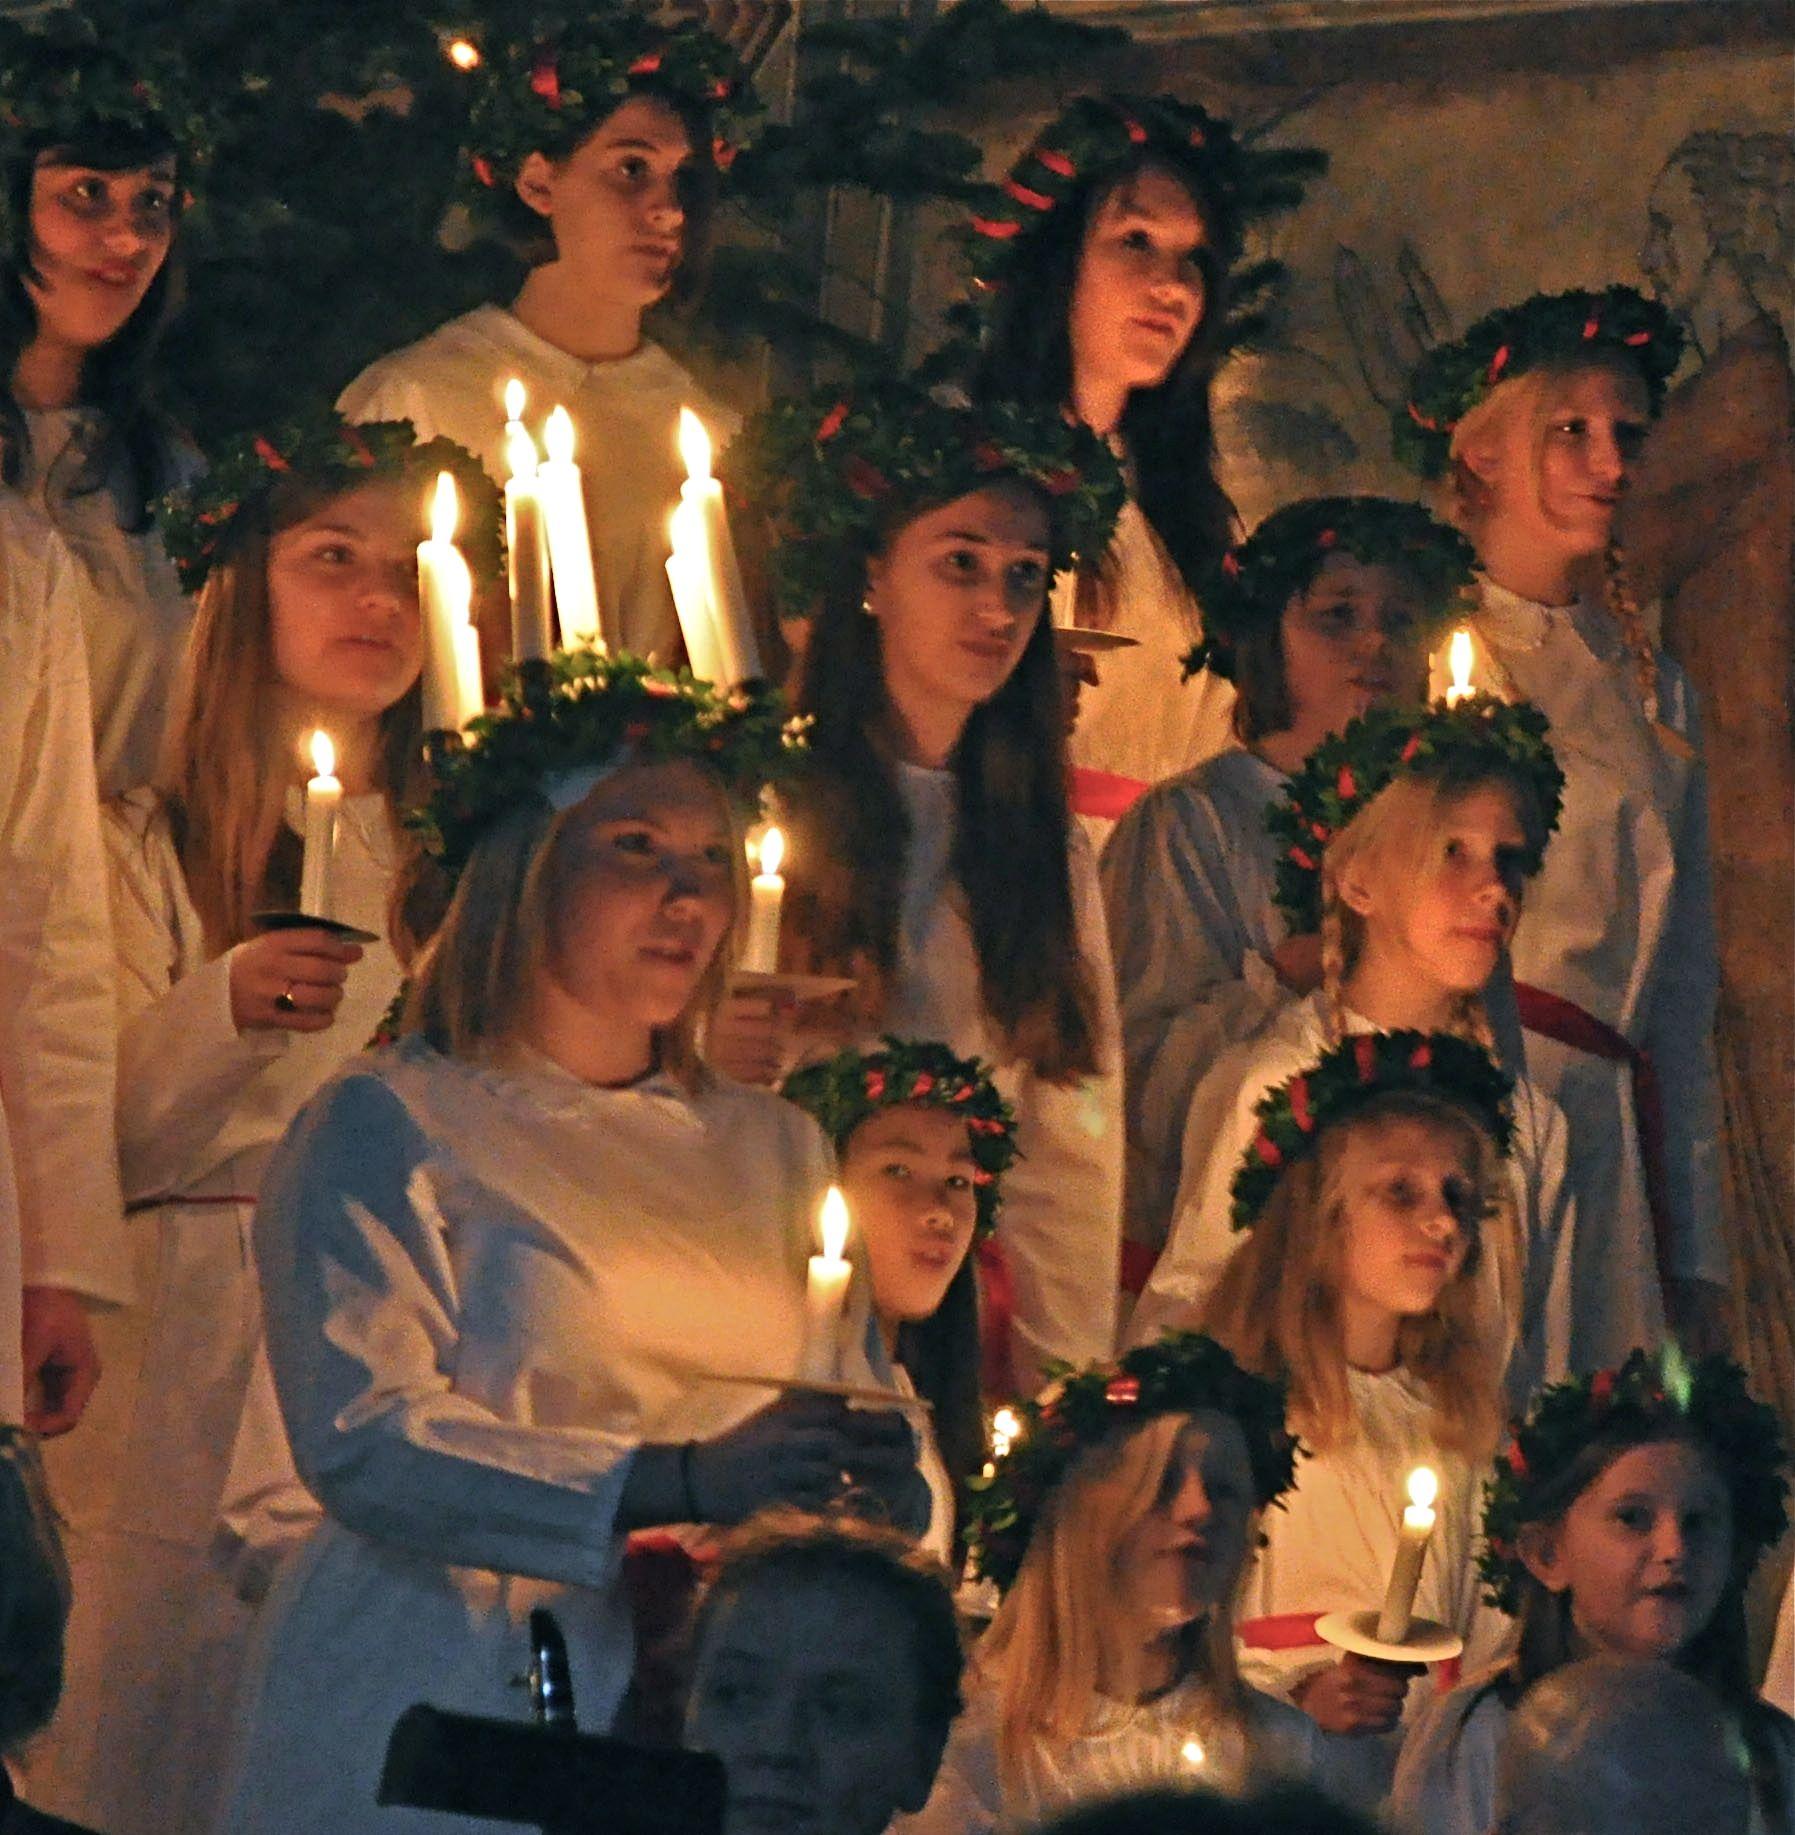 Scandinavian Festival Of Saint Lucia According To The Julian Calendar Marks Dec 13th As The Start O Scandinavian Christmas Sankta Lucia Swedish Traditions